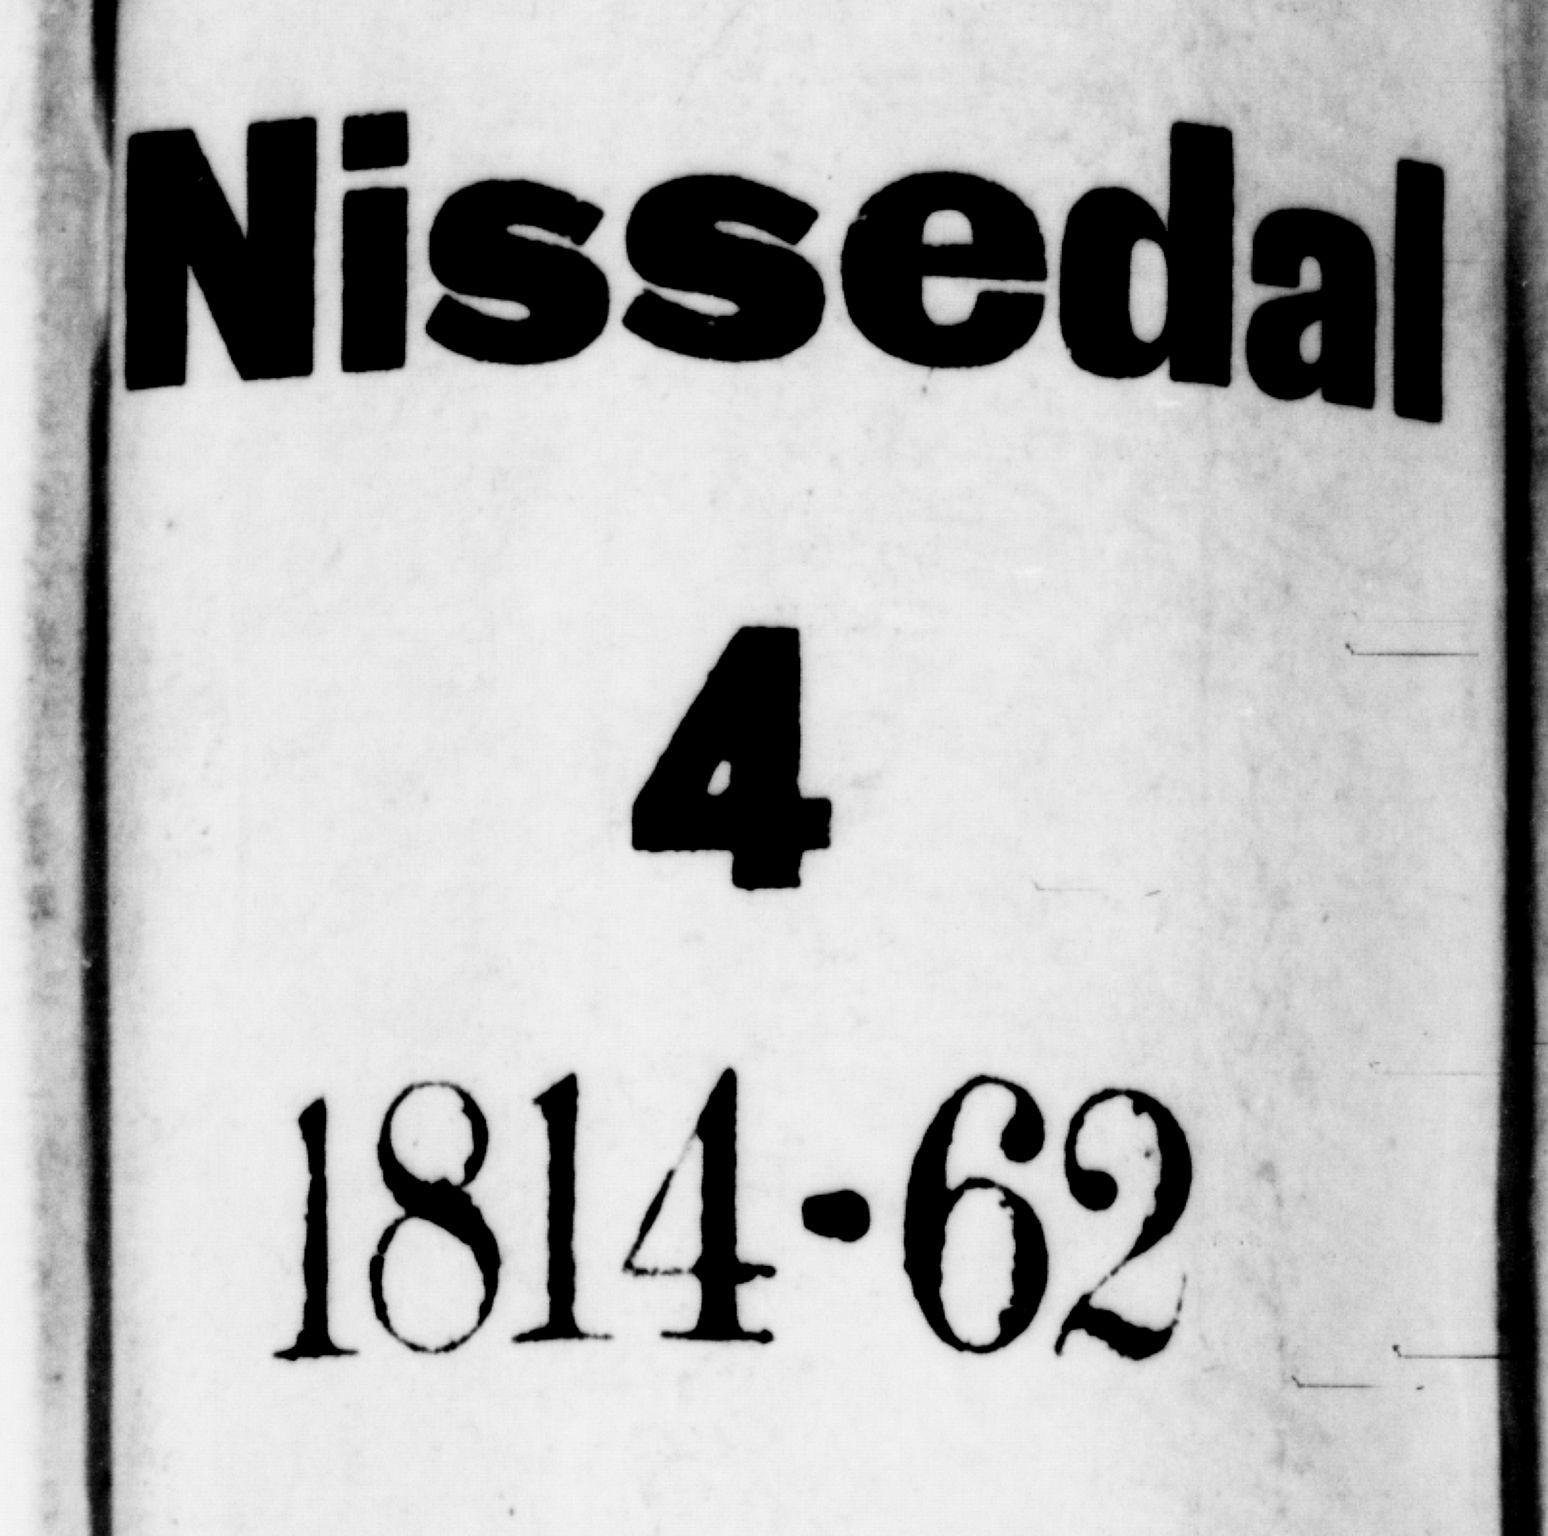 SAKO, Nissedal kirkebøker, G/Gb/L0001: Klokkerbok nr. II 1, 1814-1862